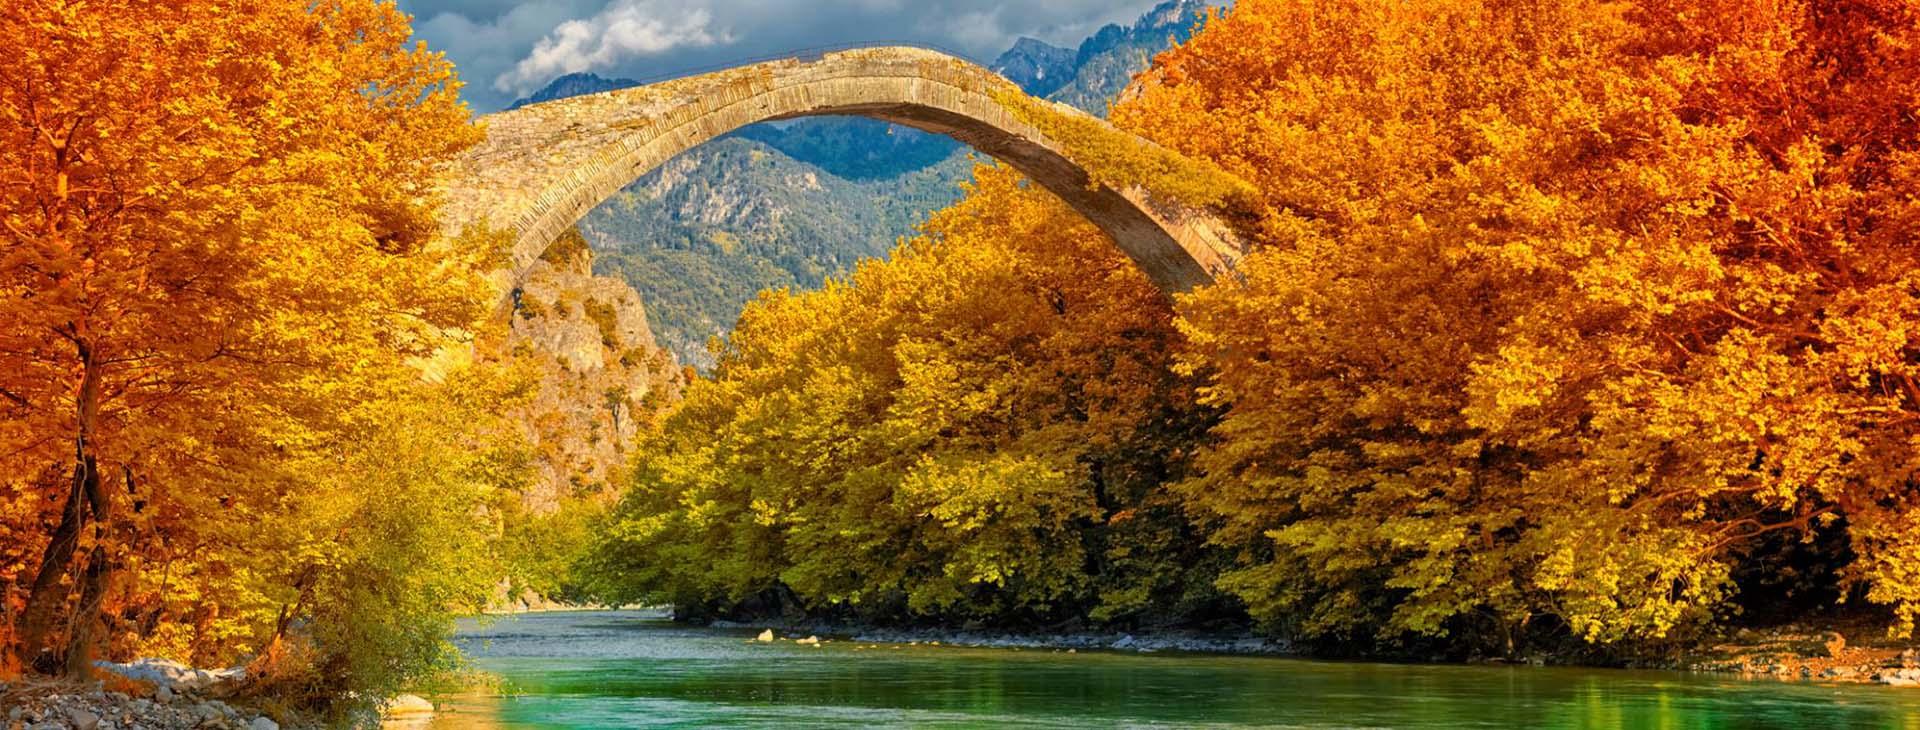 Konitsa bridge, Zagori, Ioannina